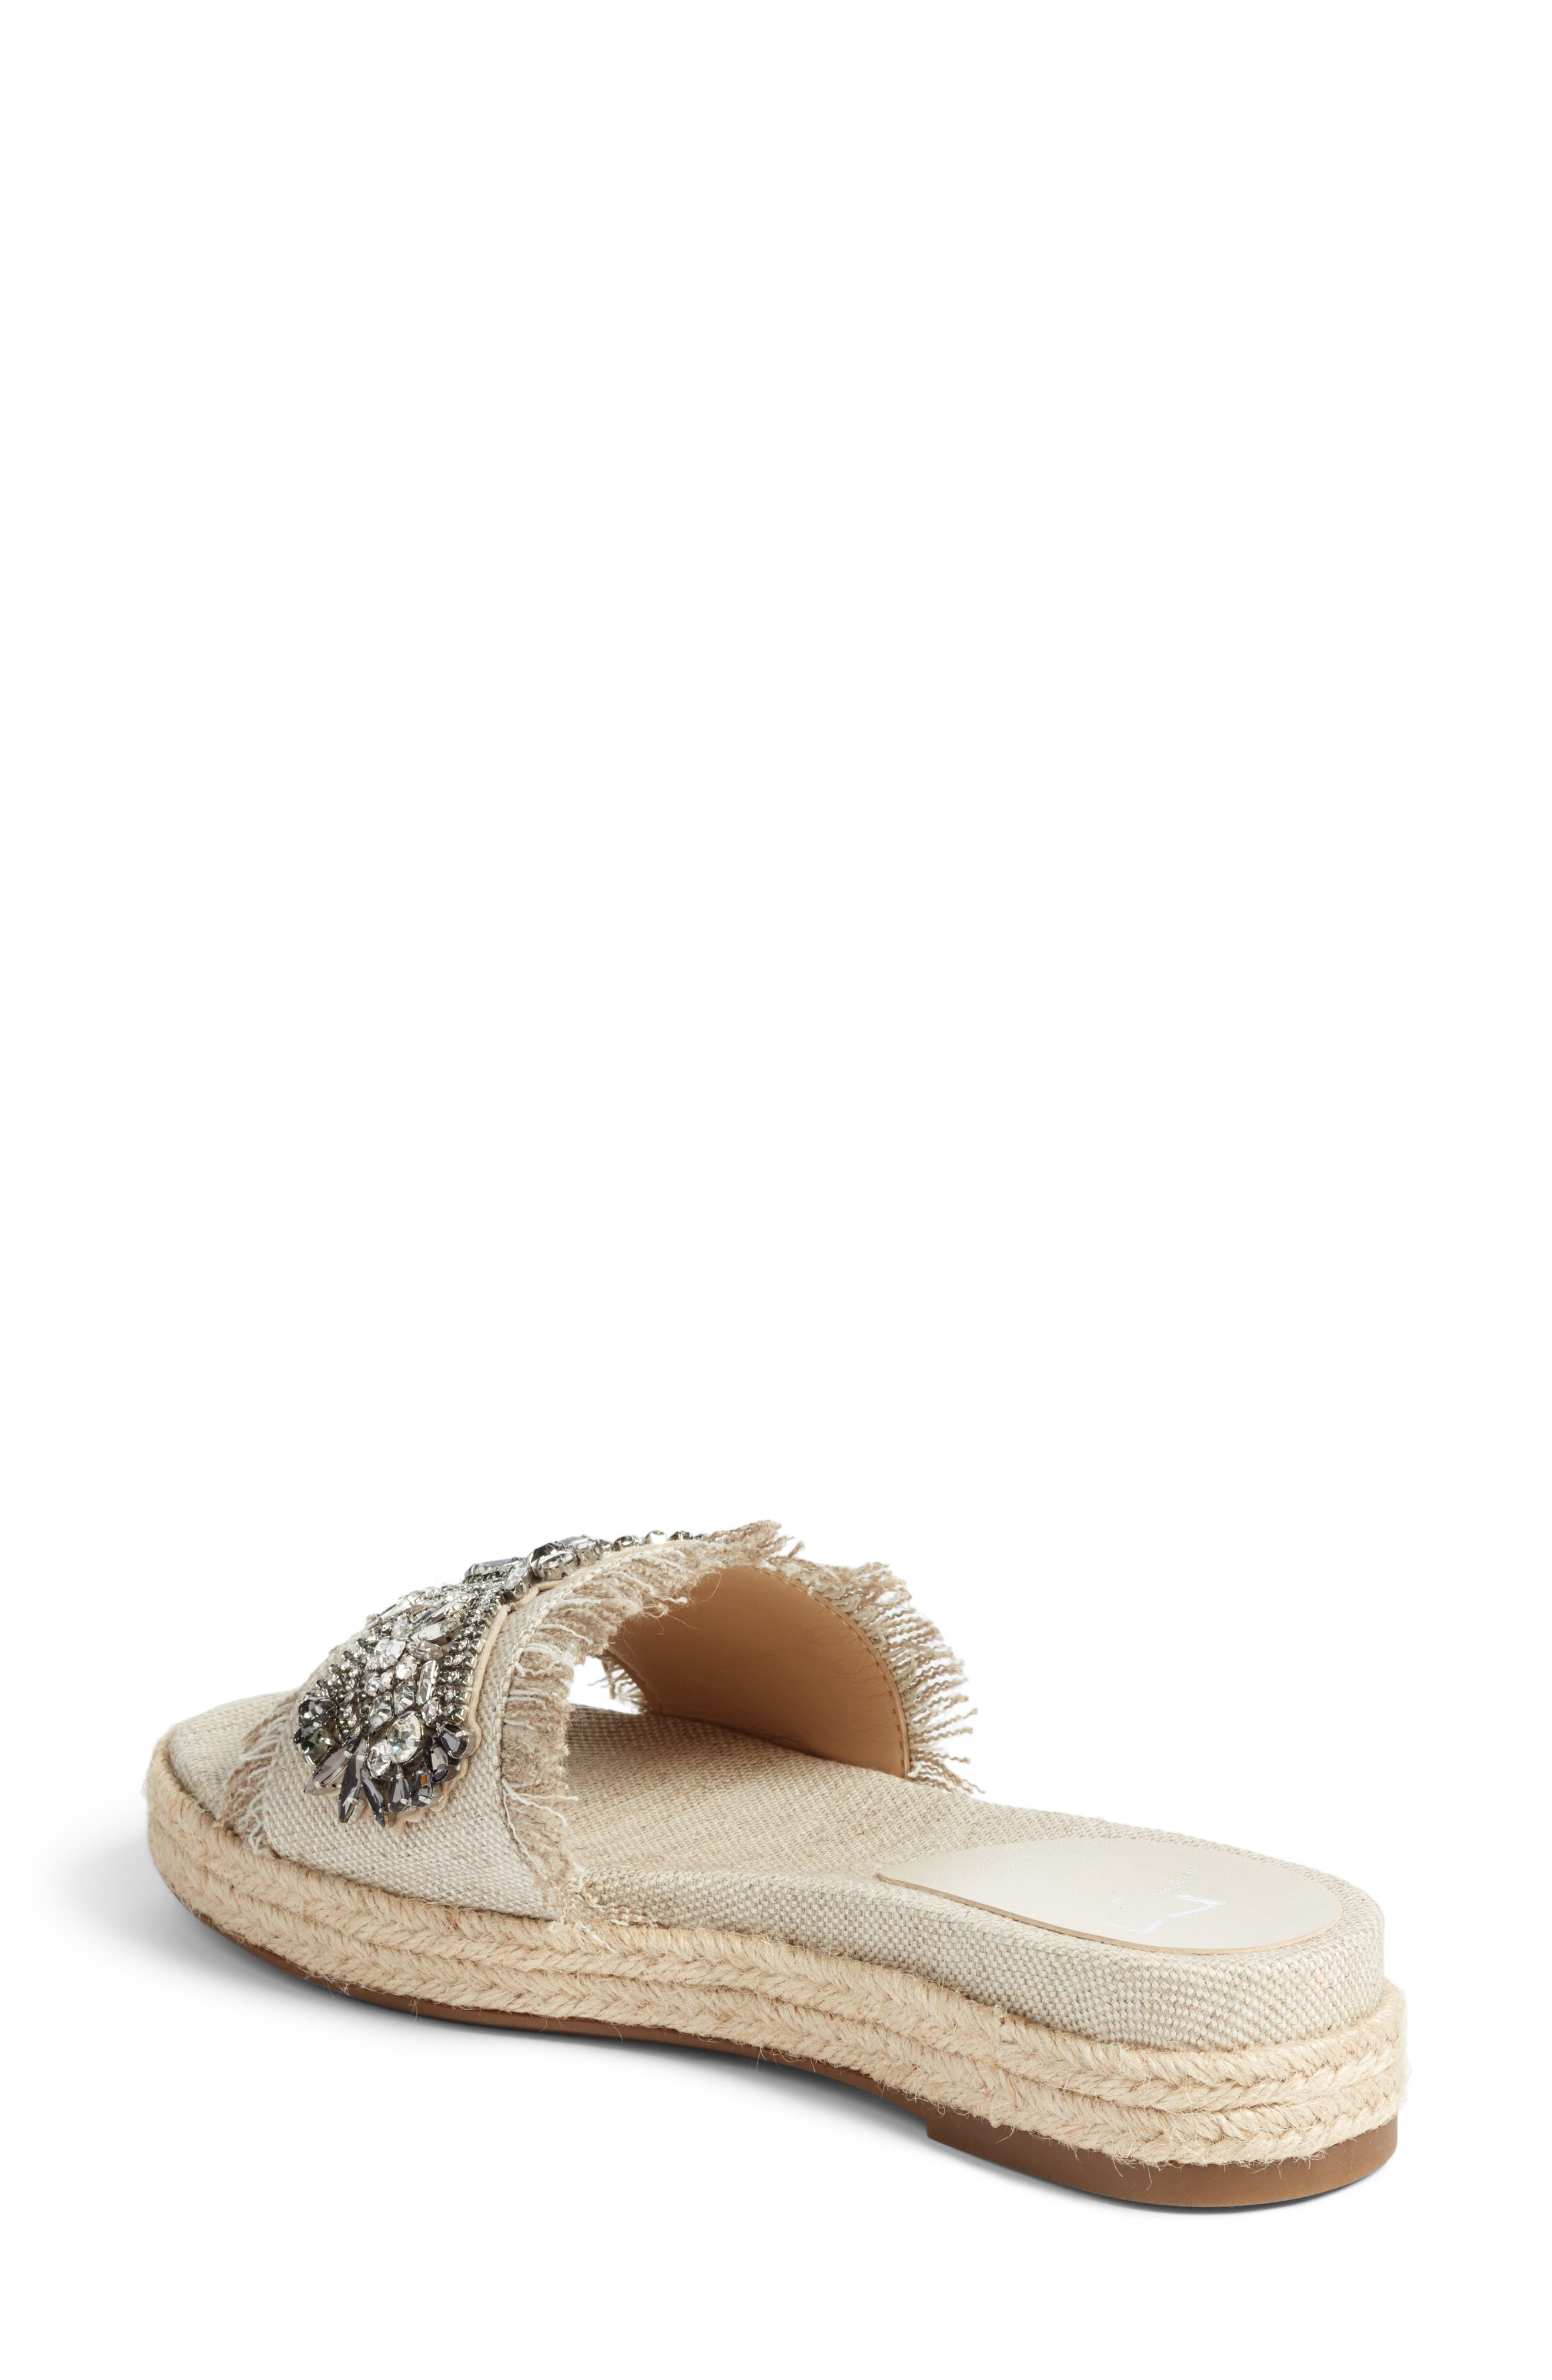 Jelly II Embellished Sandal,                             Alternate thumbnail 2, color,                             200